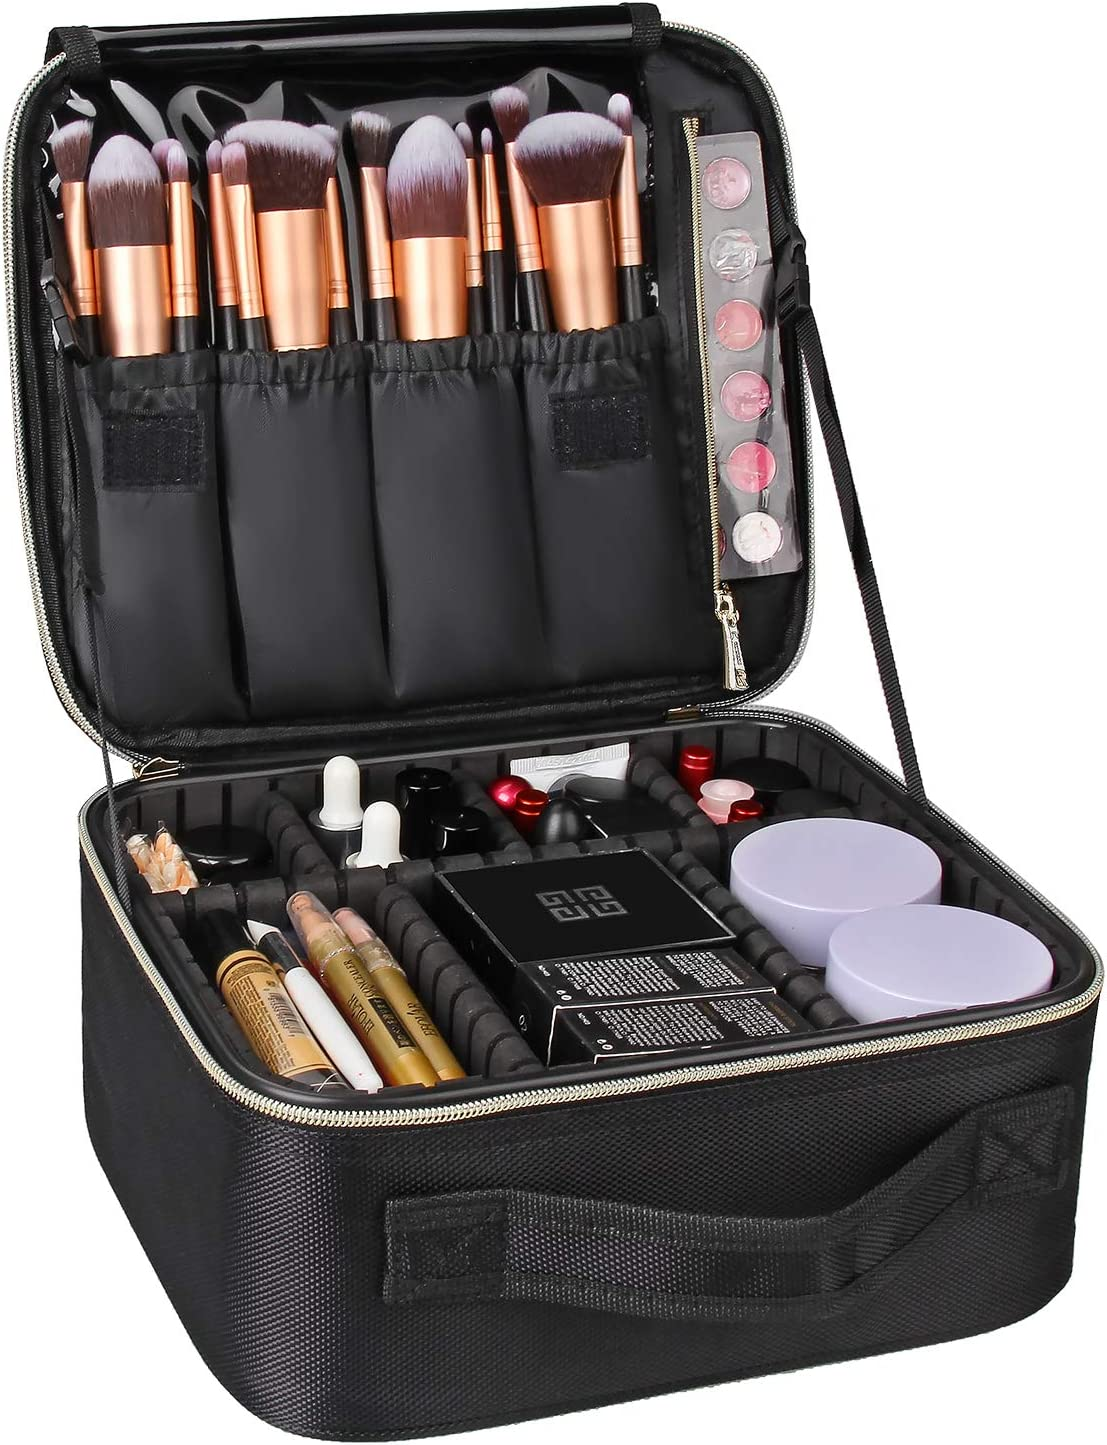 MONSTINA Makeup Train Cases Professional Travel Makeup Bag